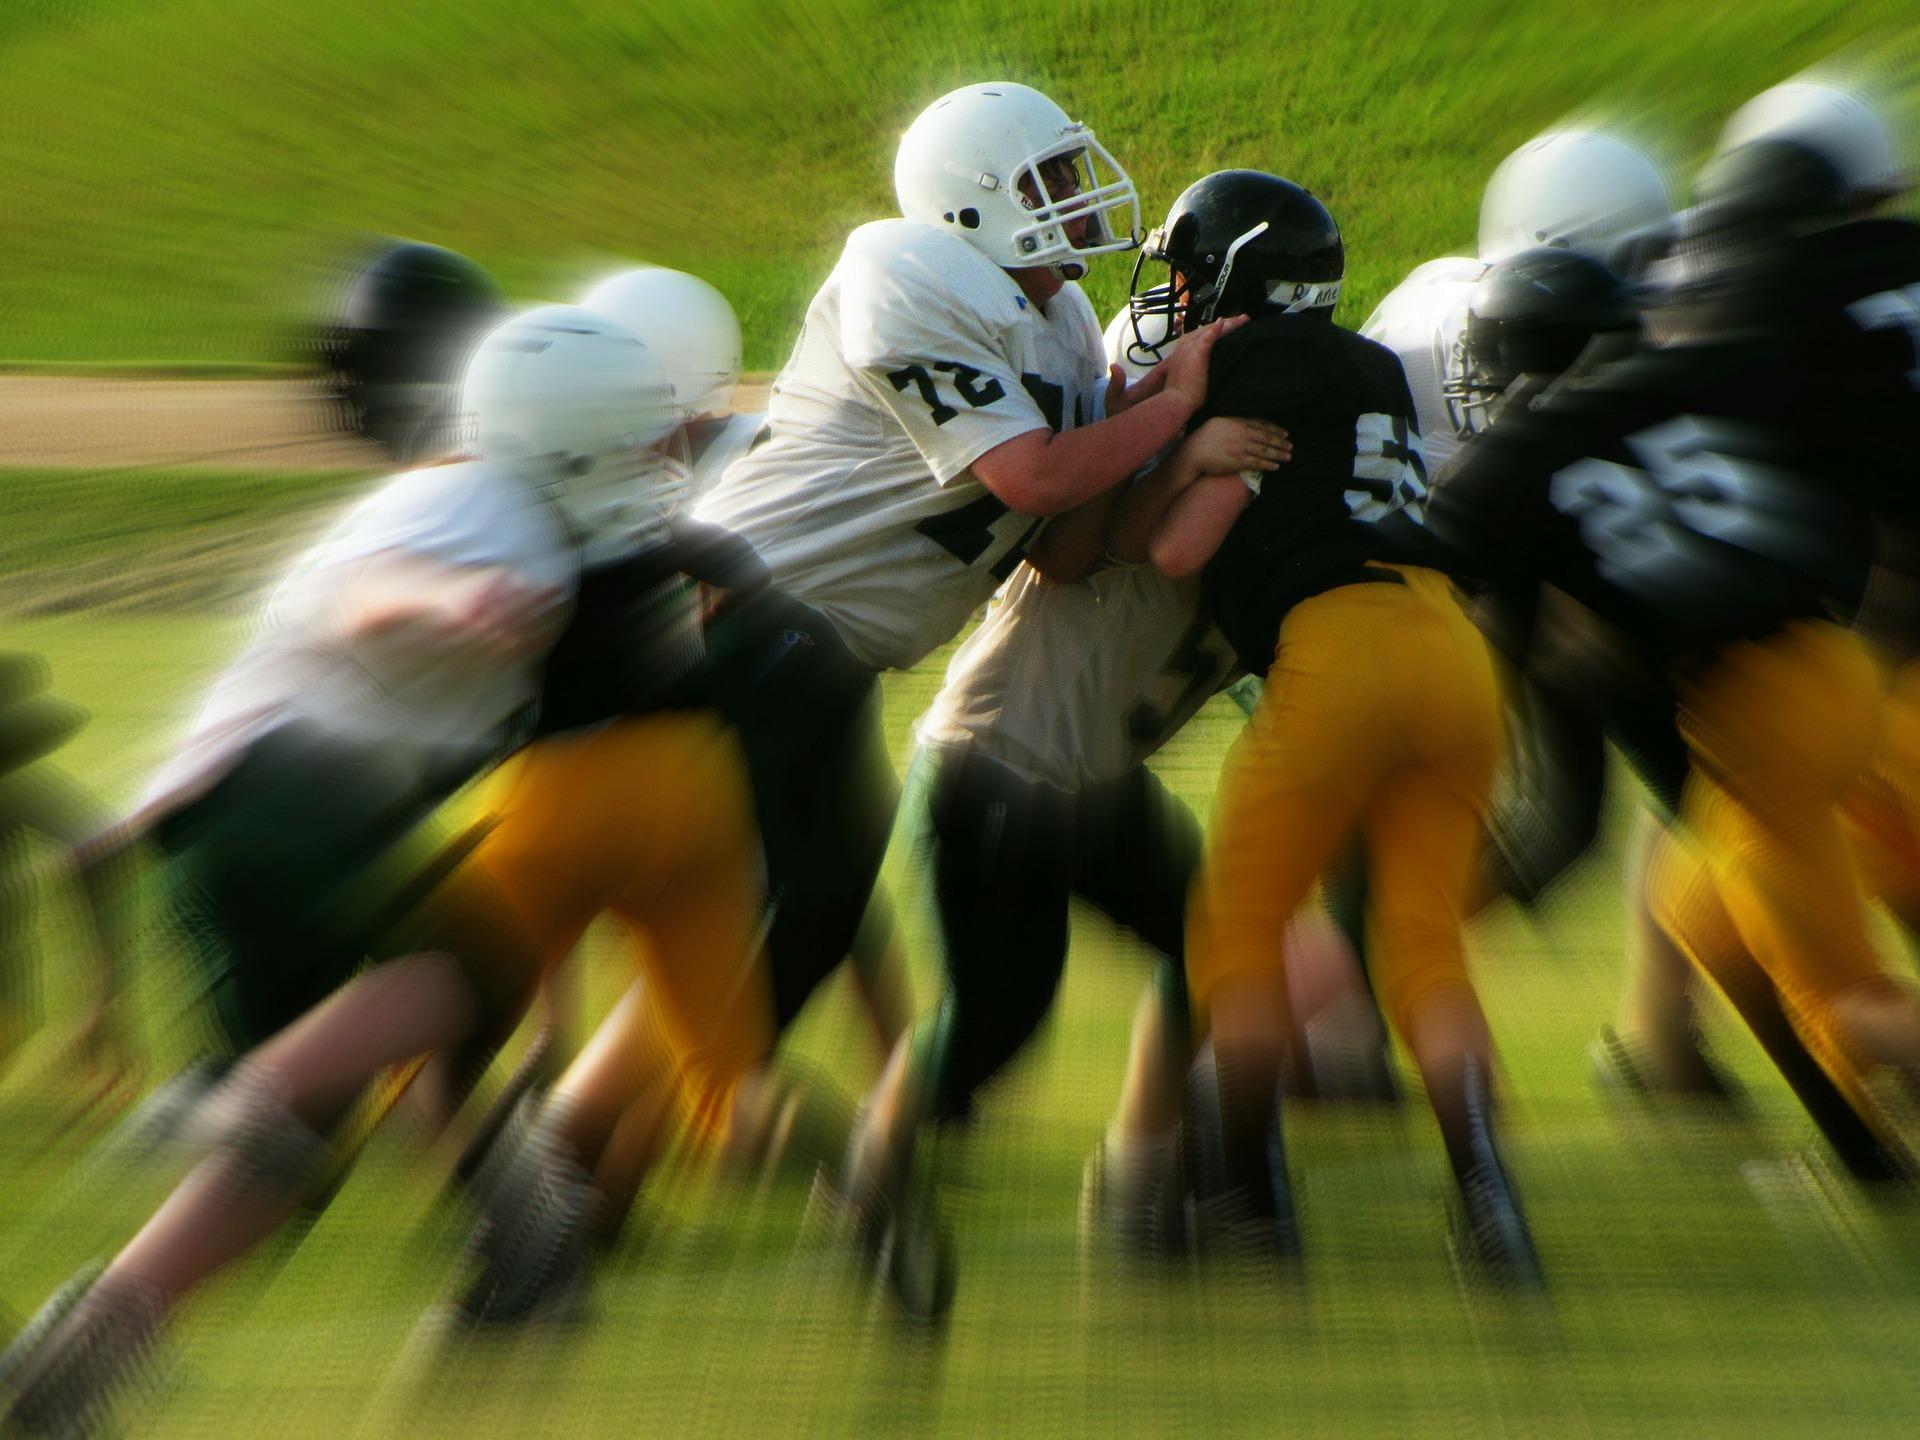 Equipo deportivo de rugby